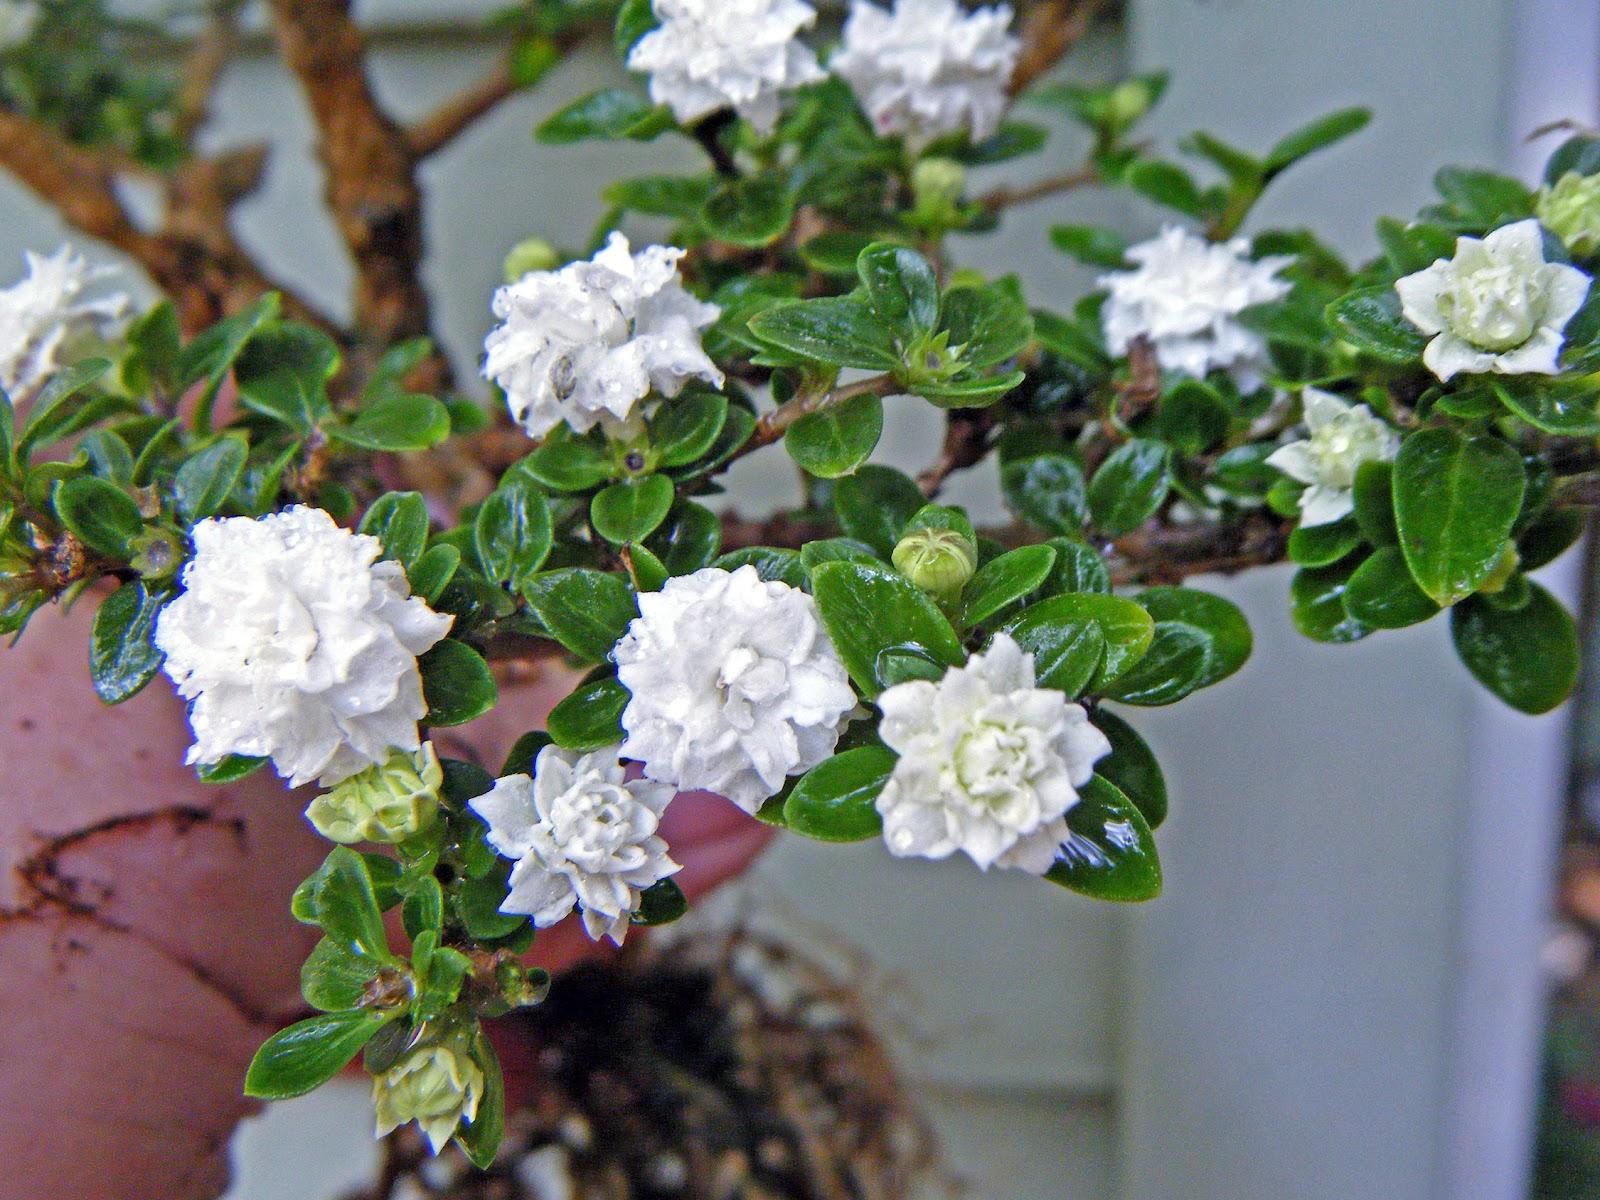 Bonsai Tree 23 Amazing Snow Rose Bonsai Images